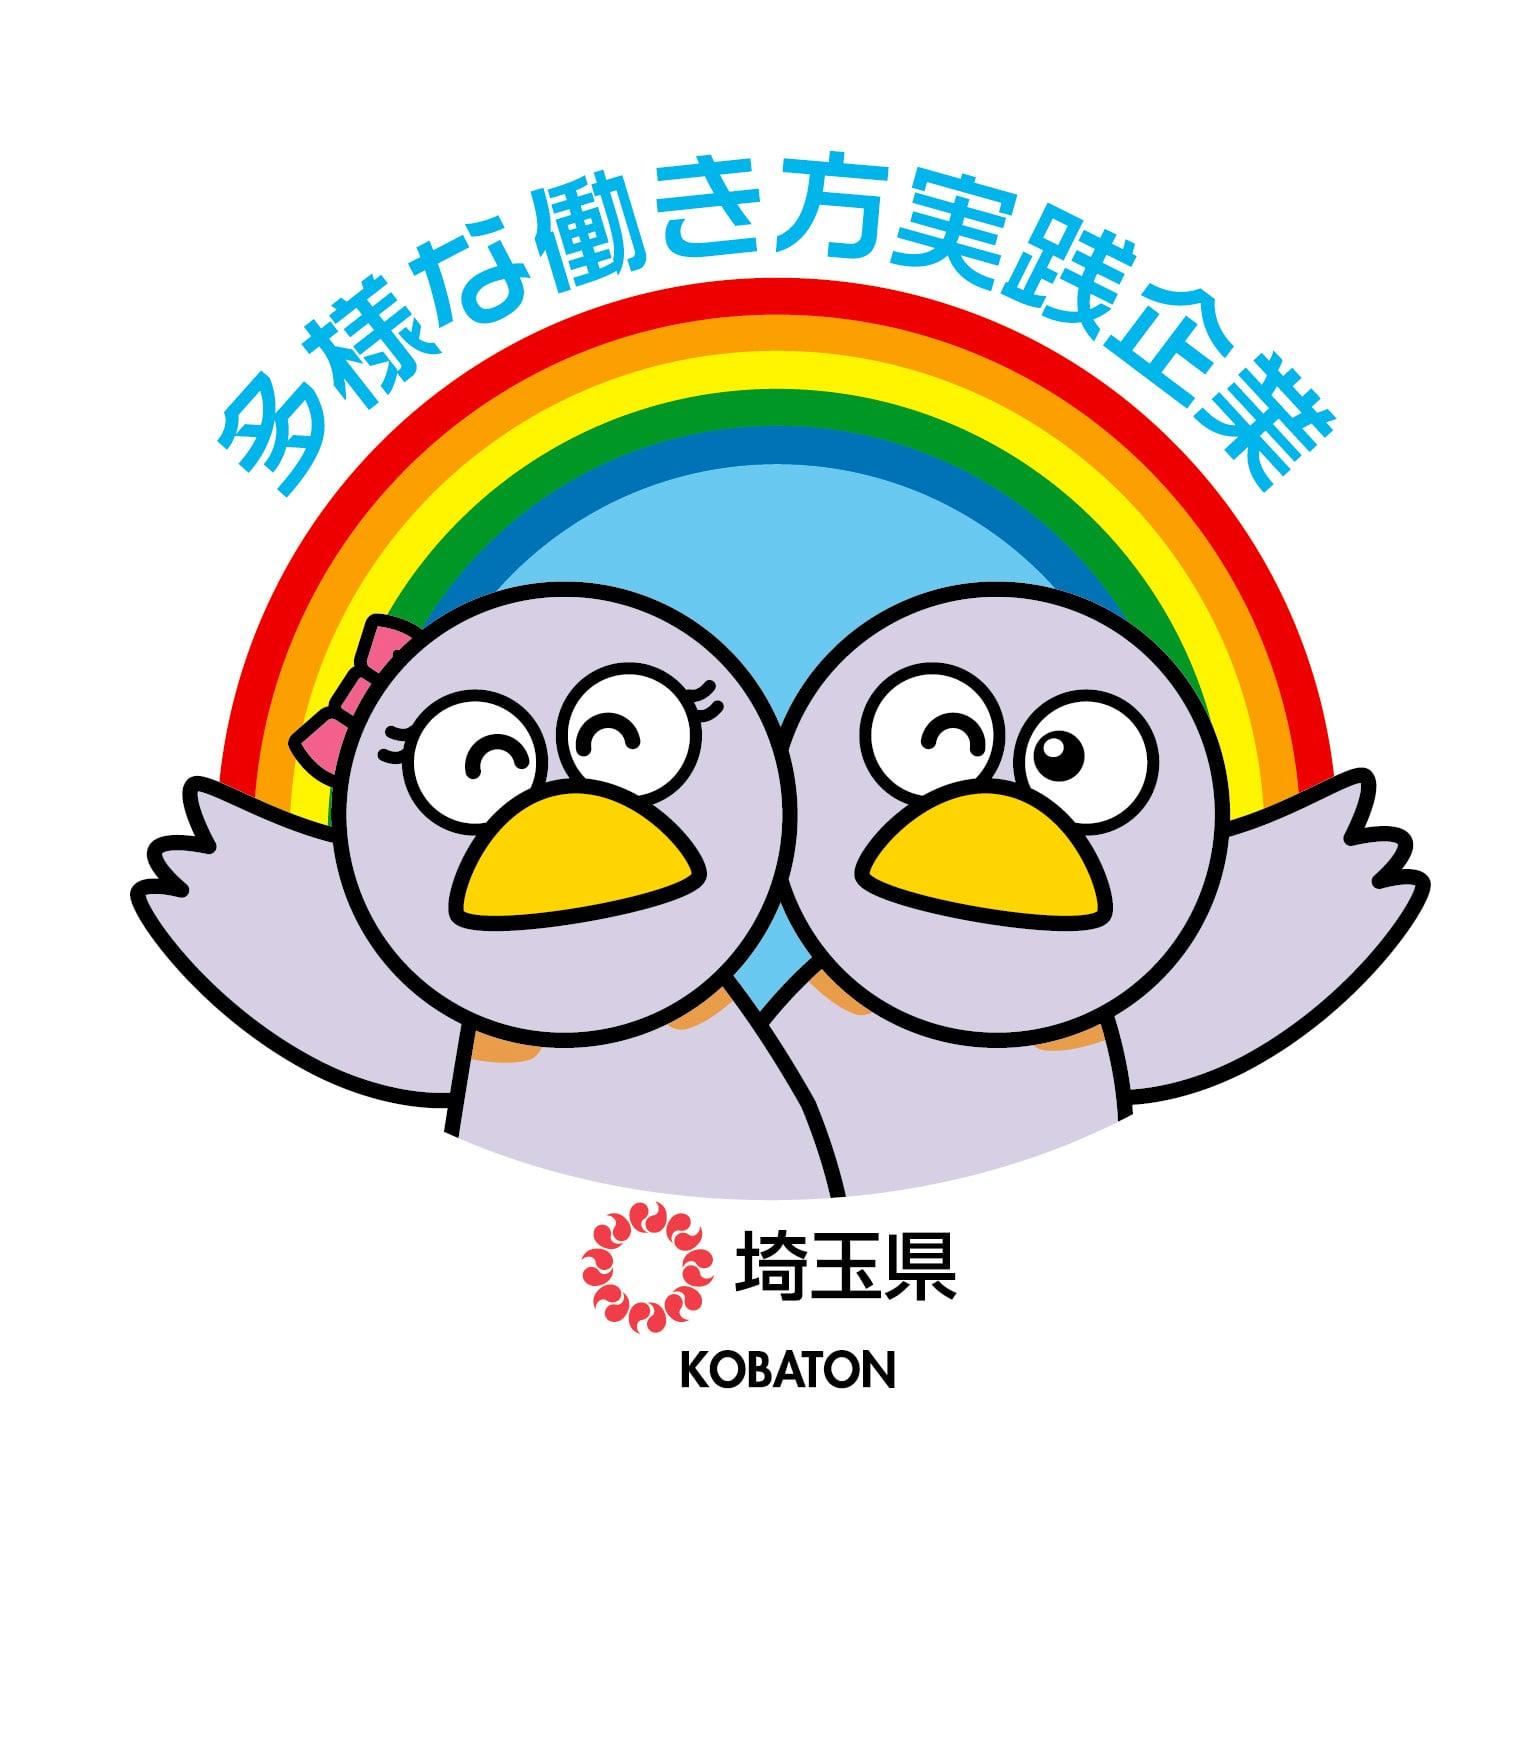 https://iseki-tokorozawa.jp/files/libs/766/202006011713307414.jpg